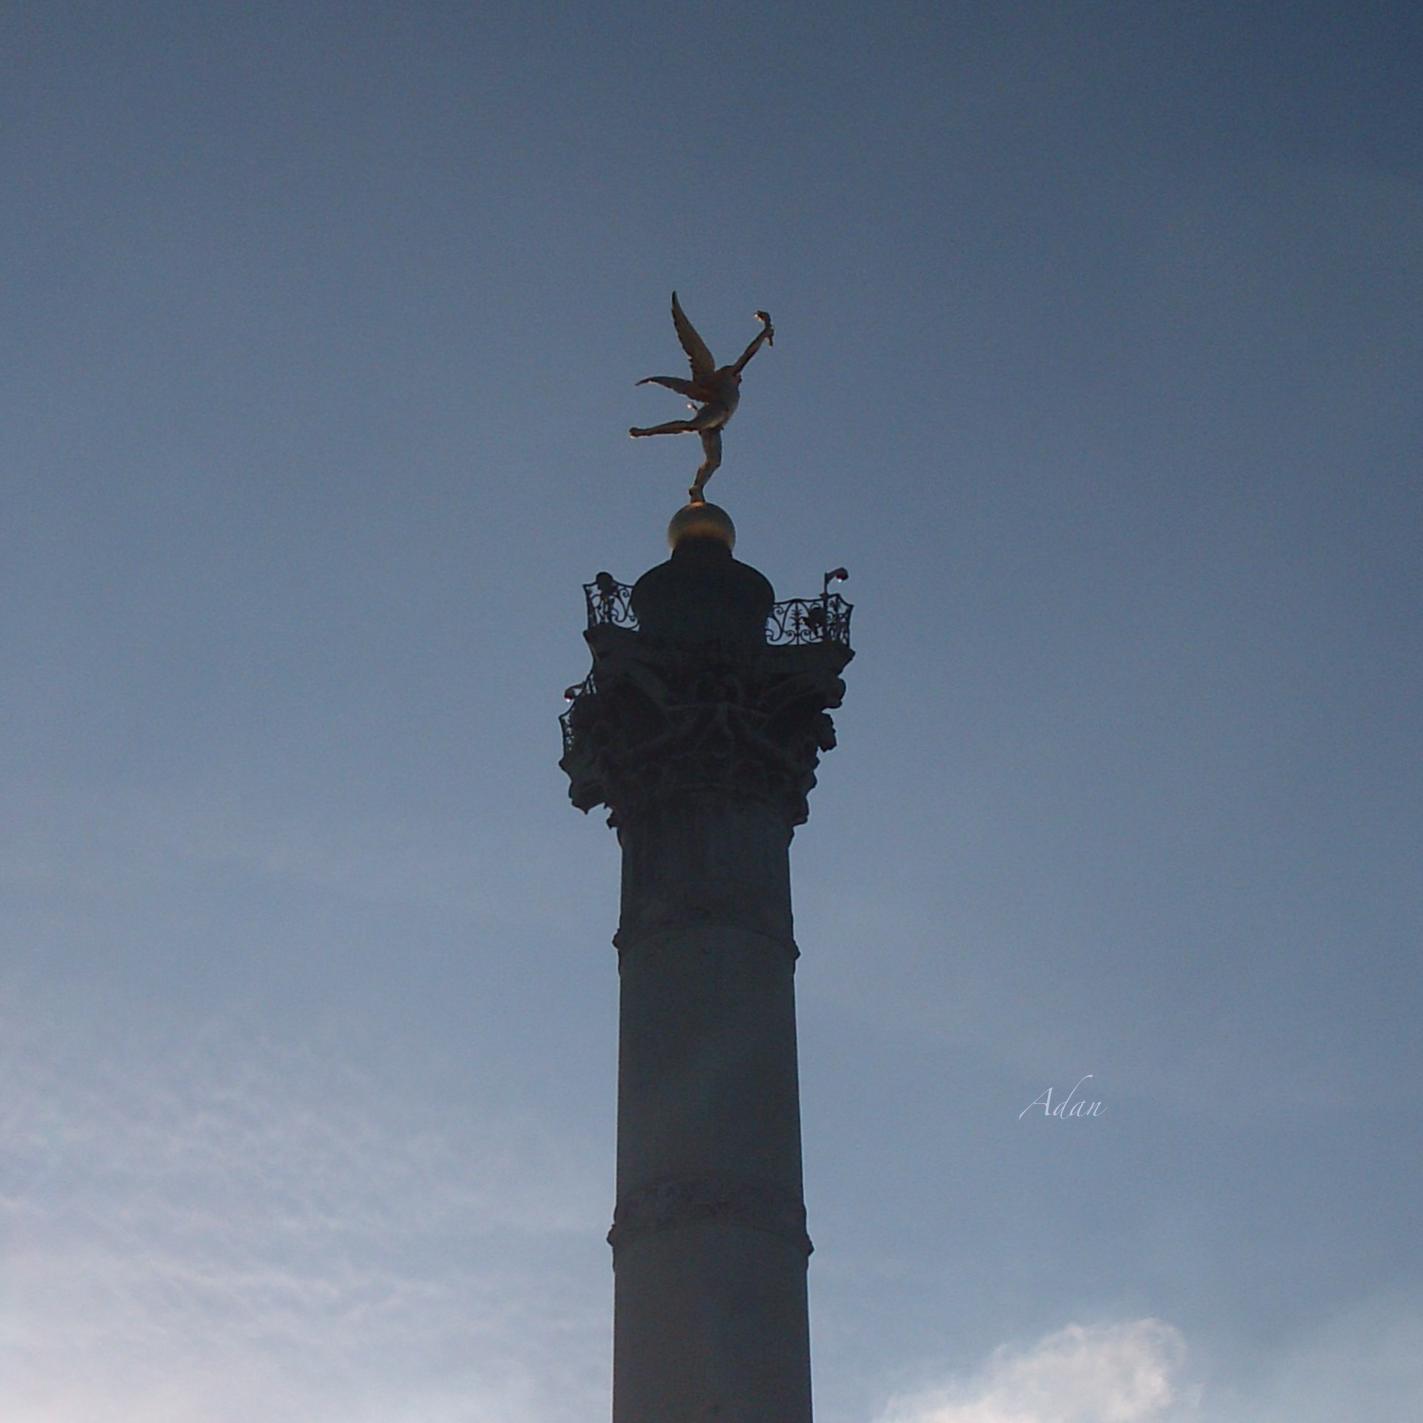 Bastille Winged Monument ©Felipe Adan Lerma https://fineartamerica.com/featured/bastille-winged-monument-paris-felipe-adan-lerma.html?newartwork=true